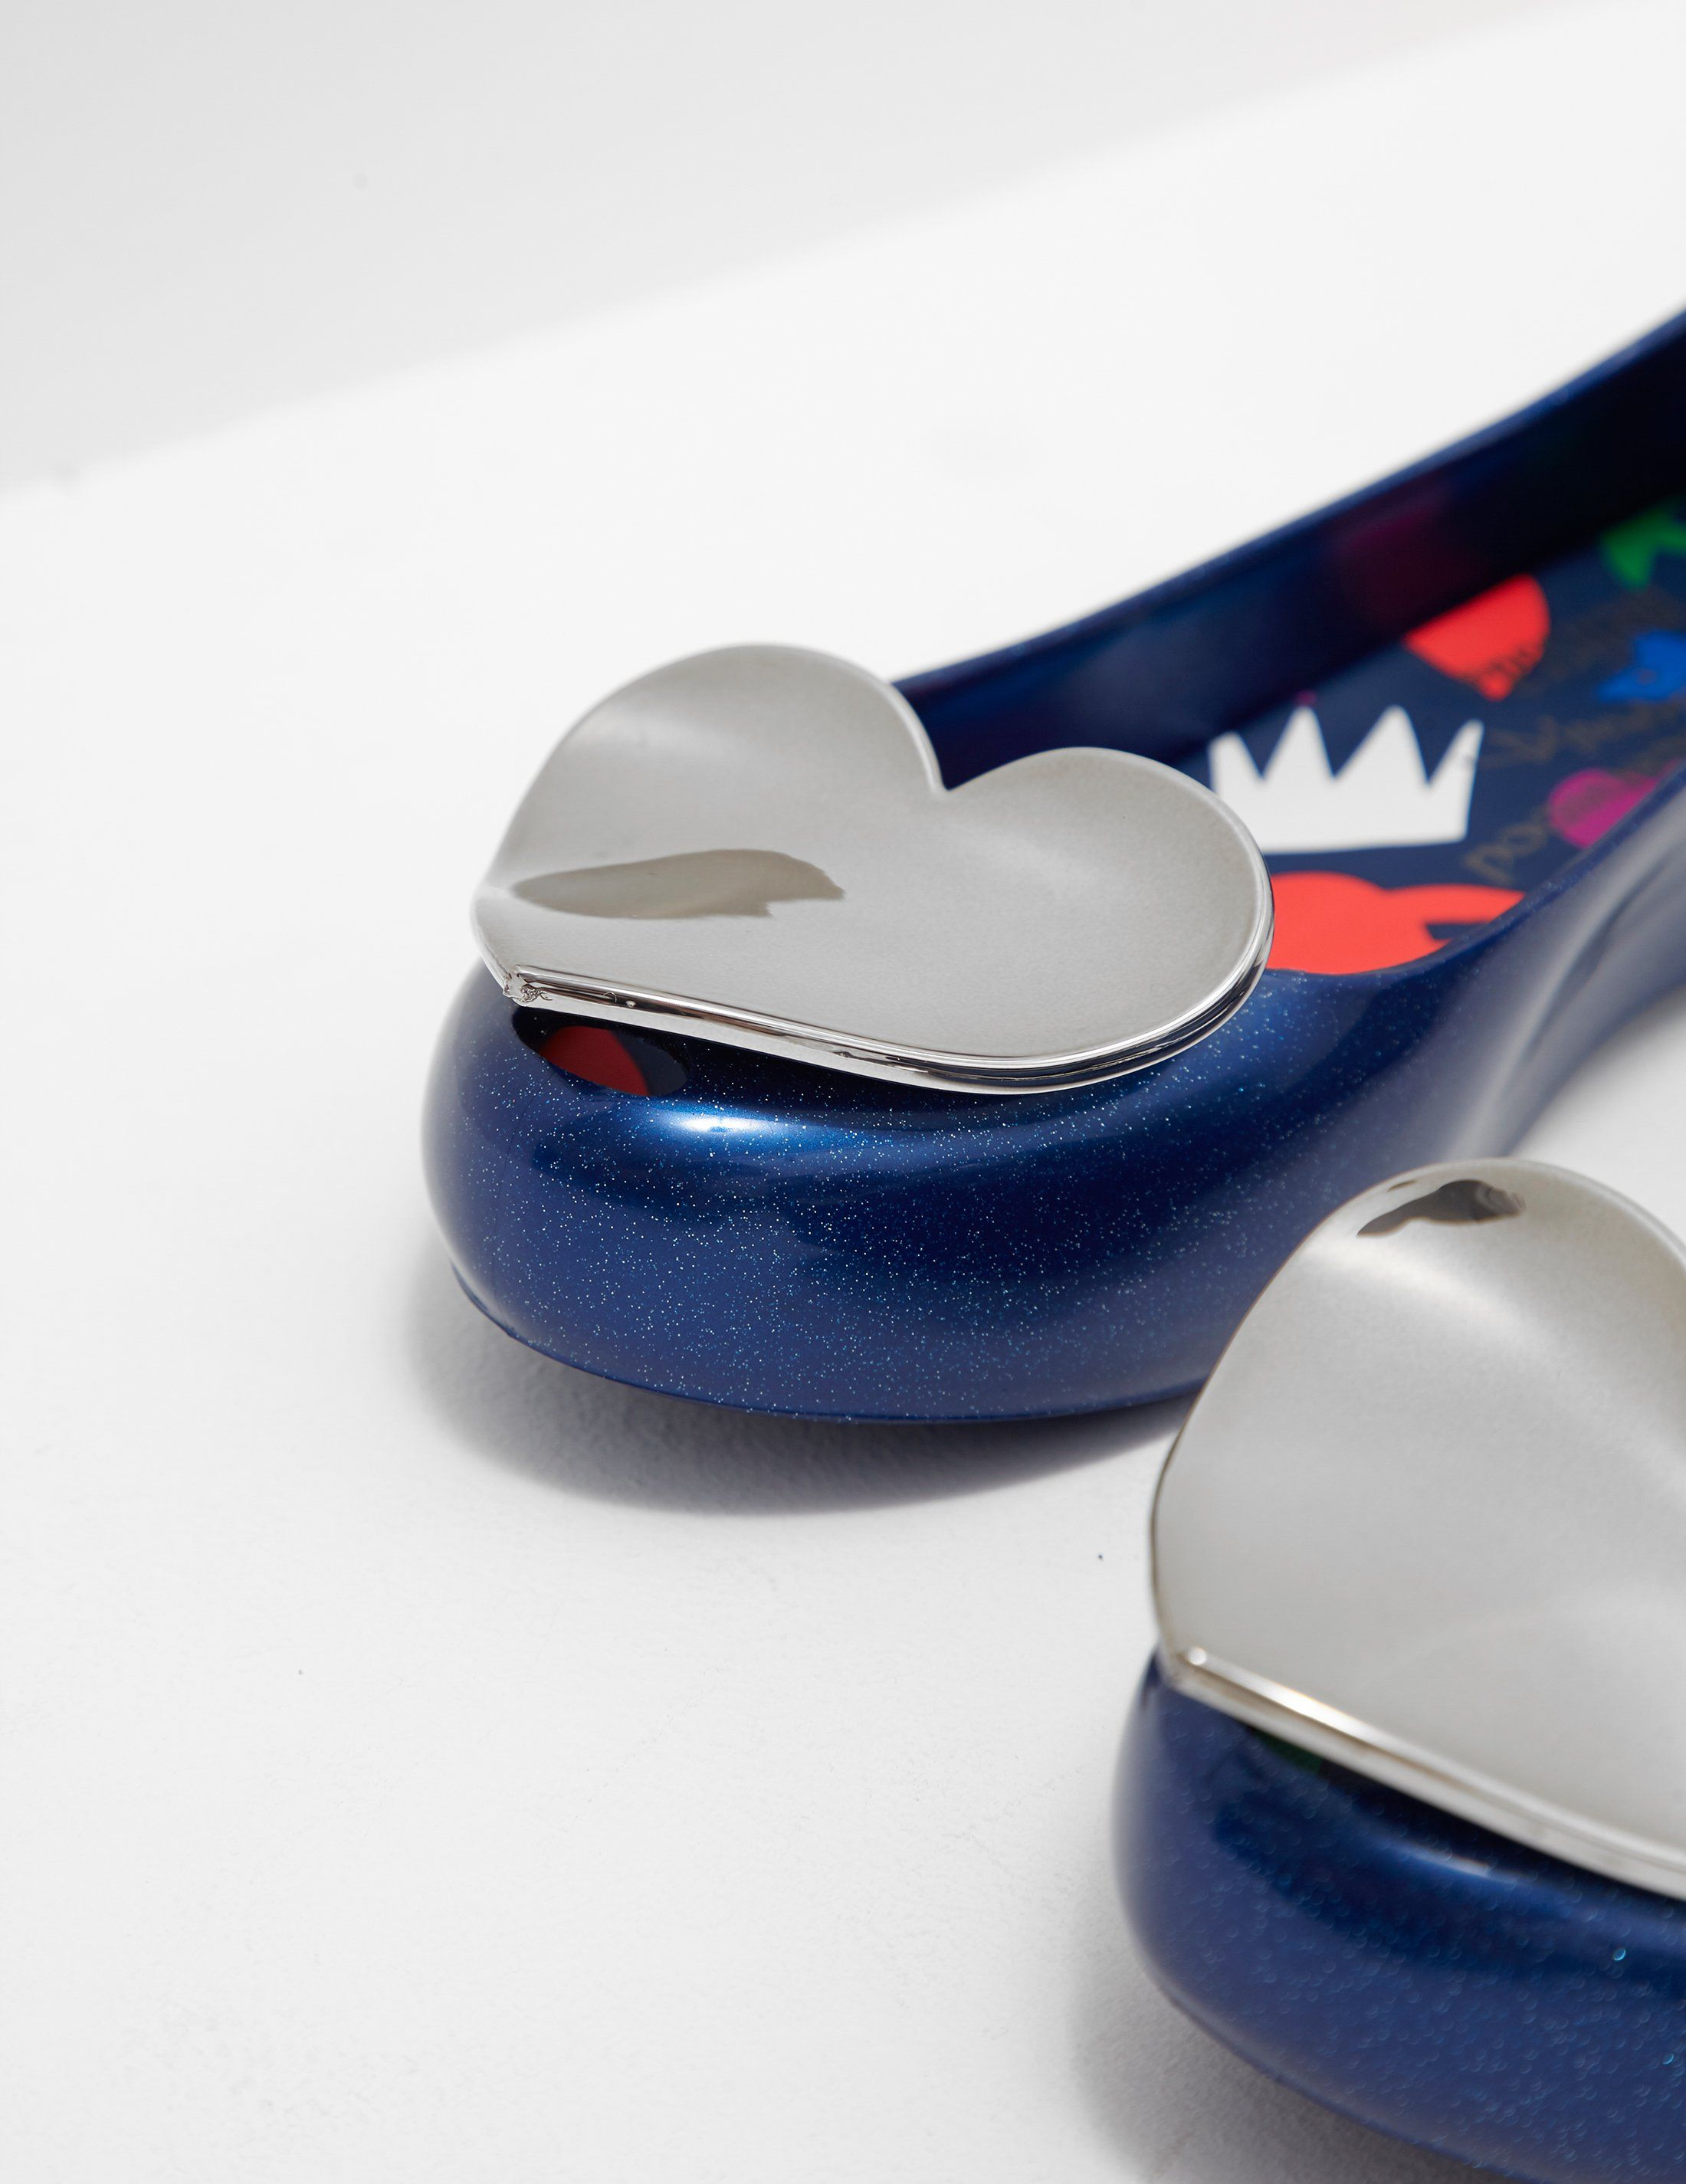 Melissa x Vivienne Westwood Anglomania Ultragirl Heart